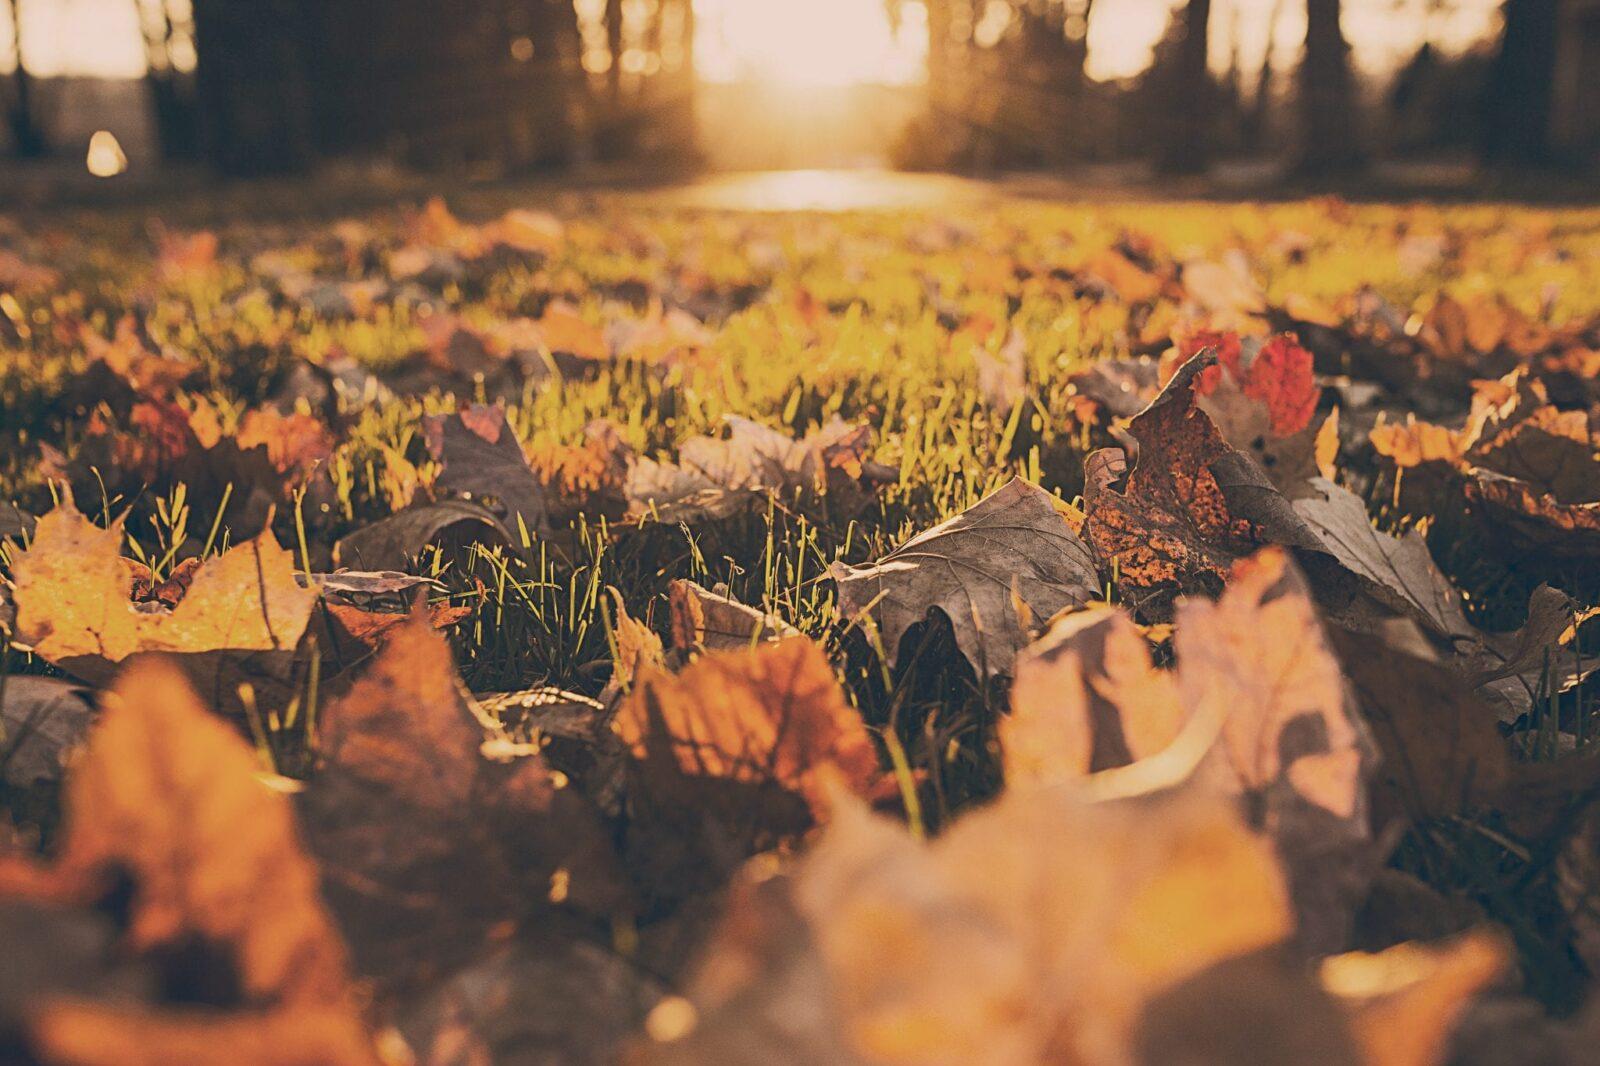 Grasveld met herfstbladeren